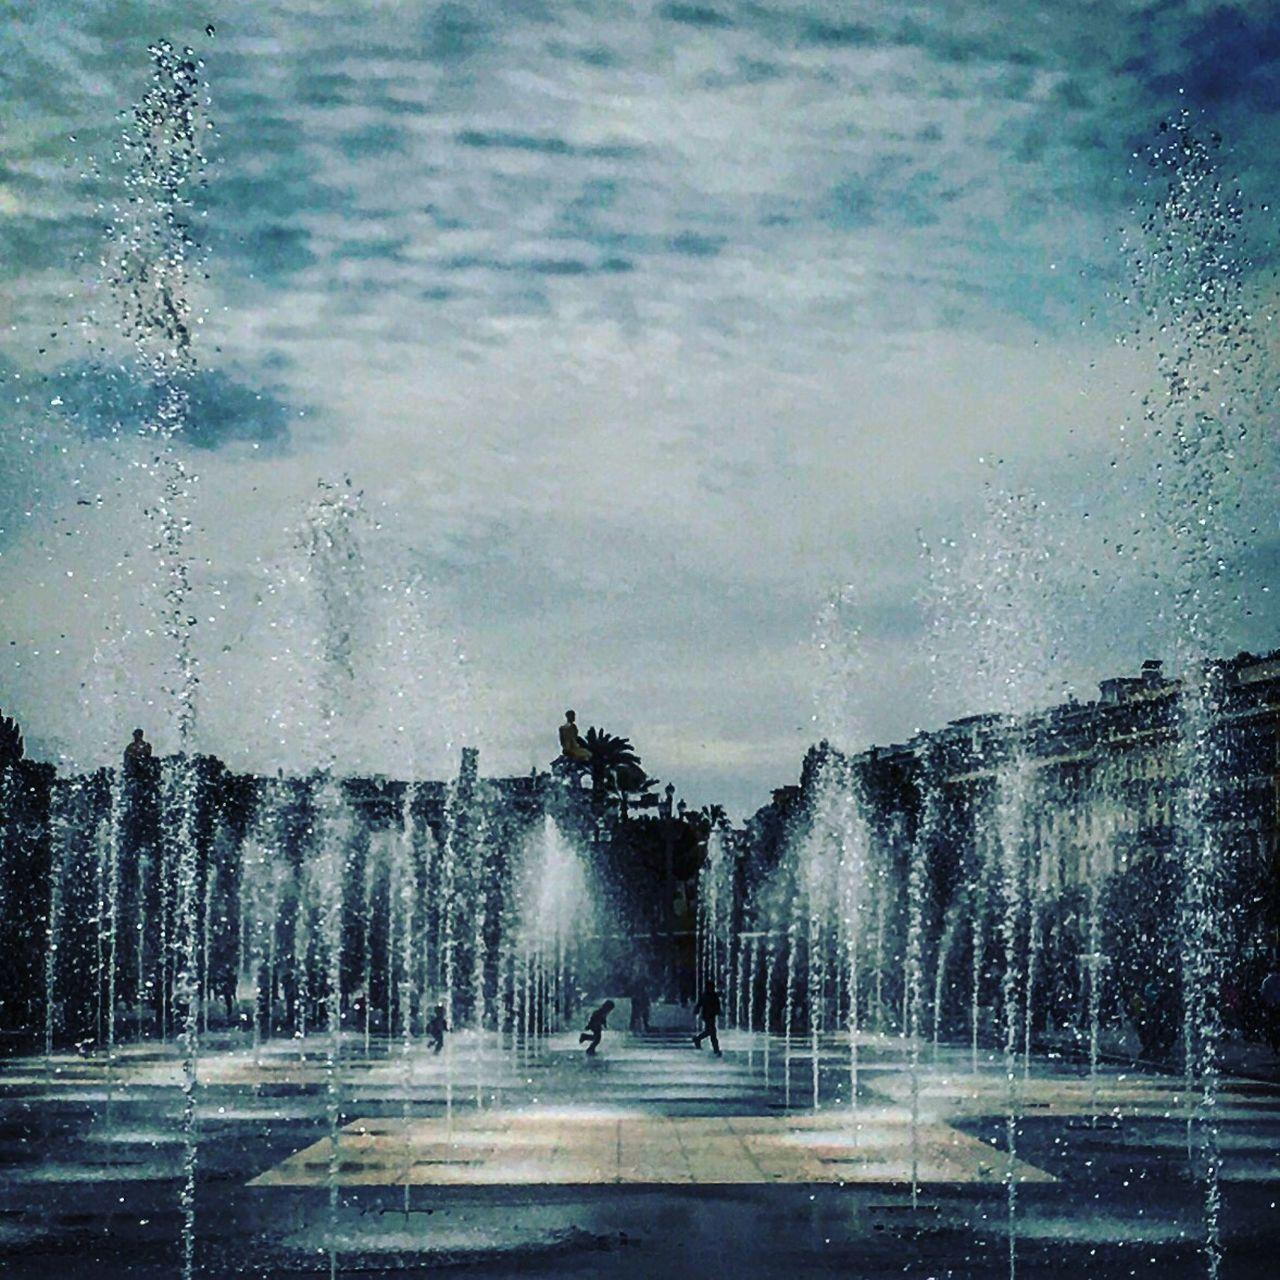 water, spraying, fountain, motion, splashing, wet, drop, sprinkler, long exposure, outdoors, day, refreshment, tree, sky, no people, car wash, nature, irrigation equipment